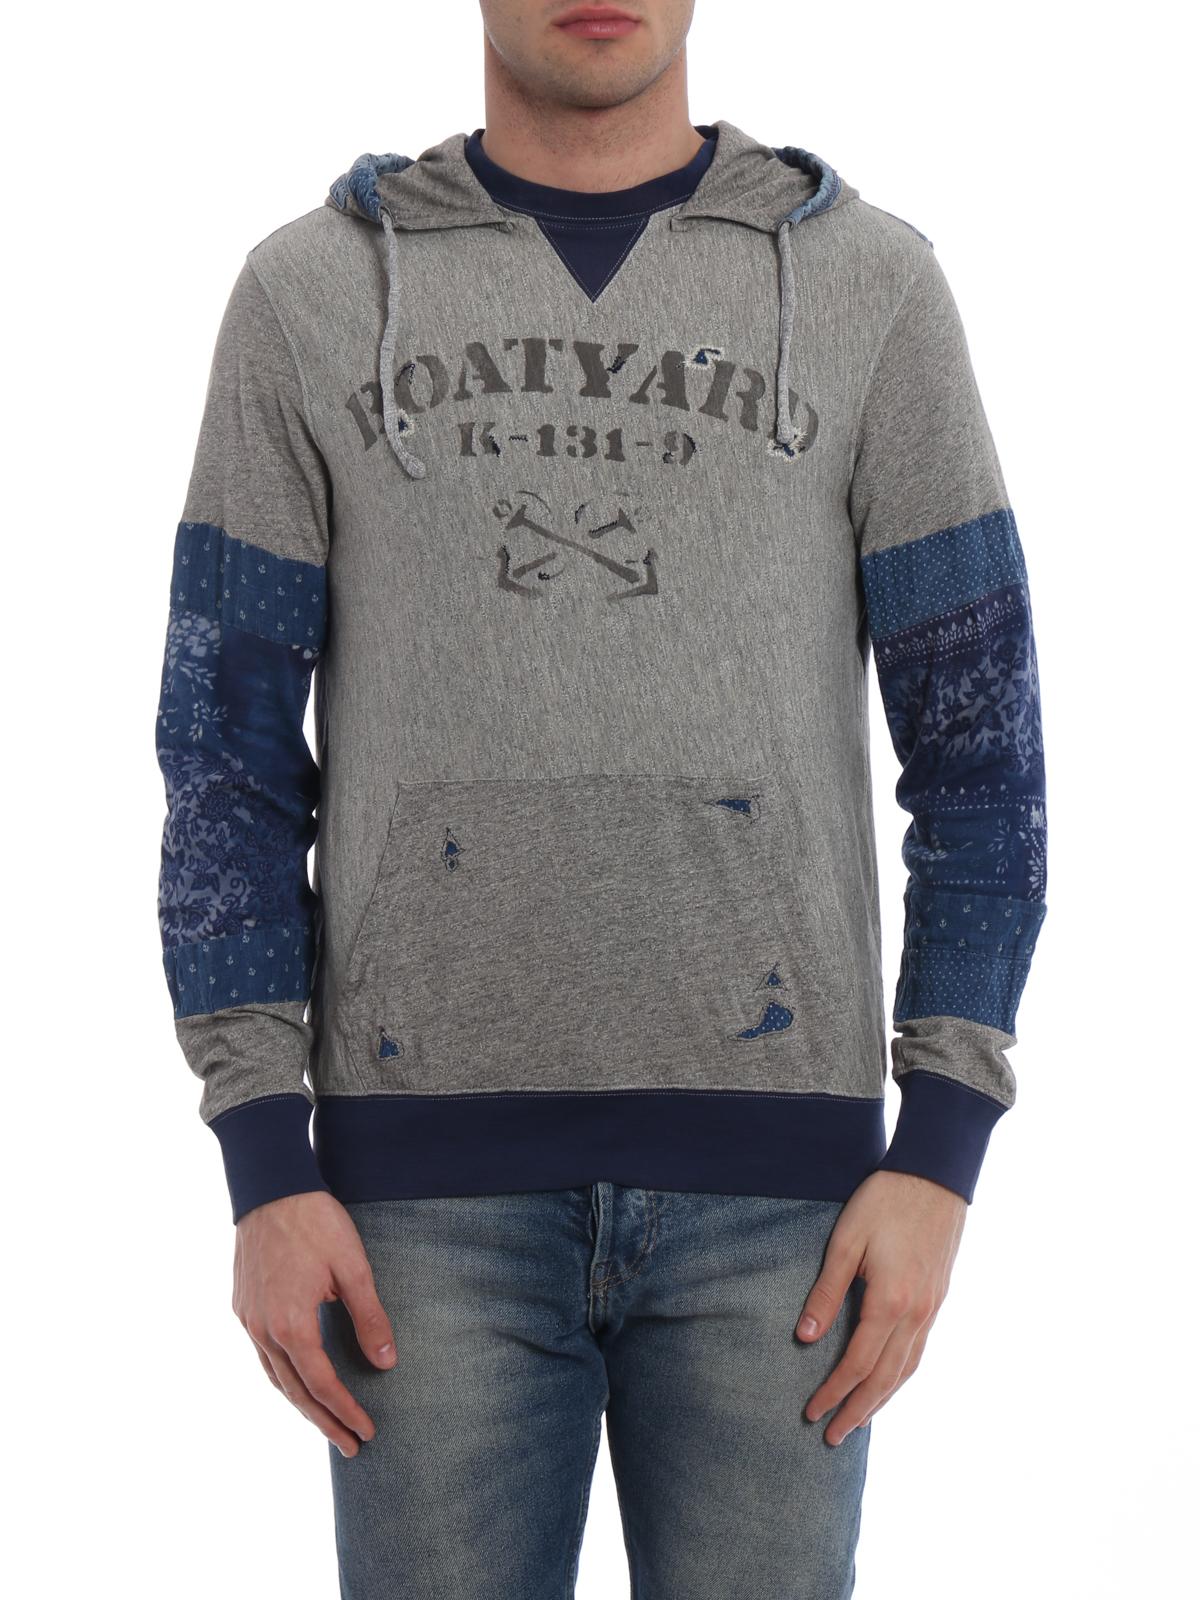 iKRIX POLO RALPH LAUREN: Sweatshirts \u0026 Sweaters - Rips detailed patchwork  hoodie